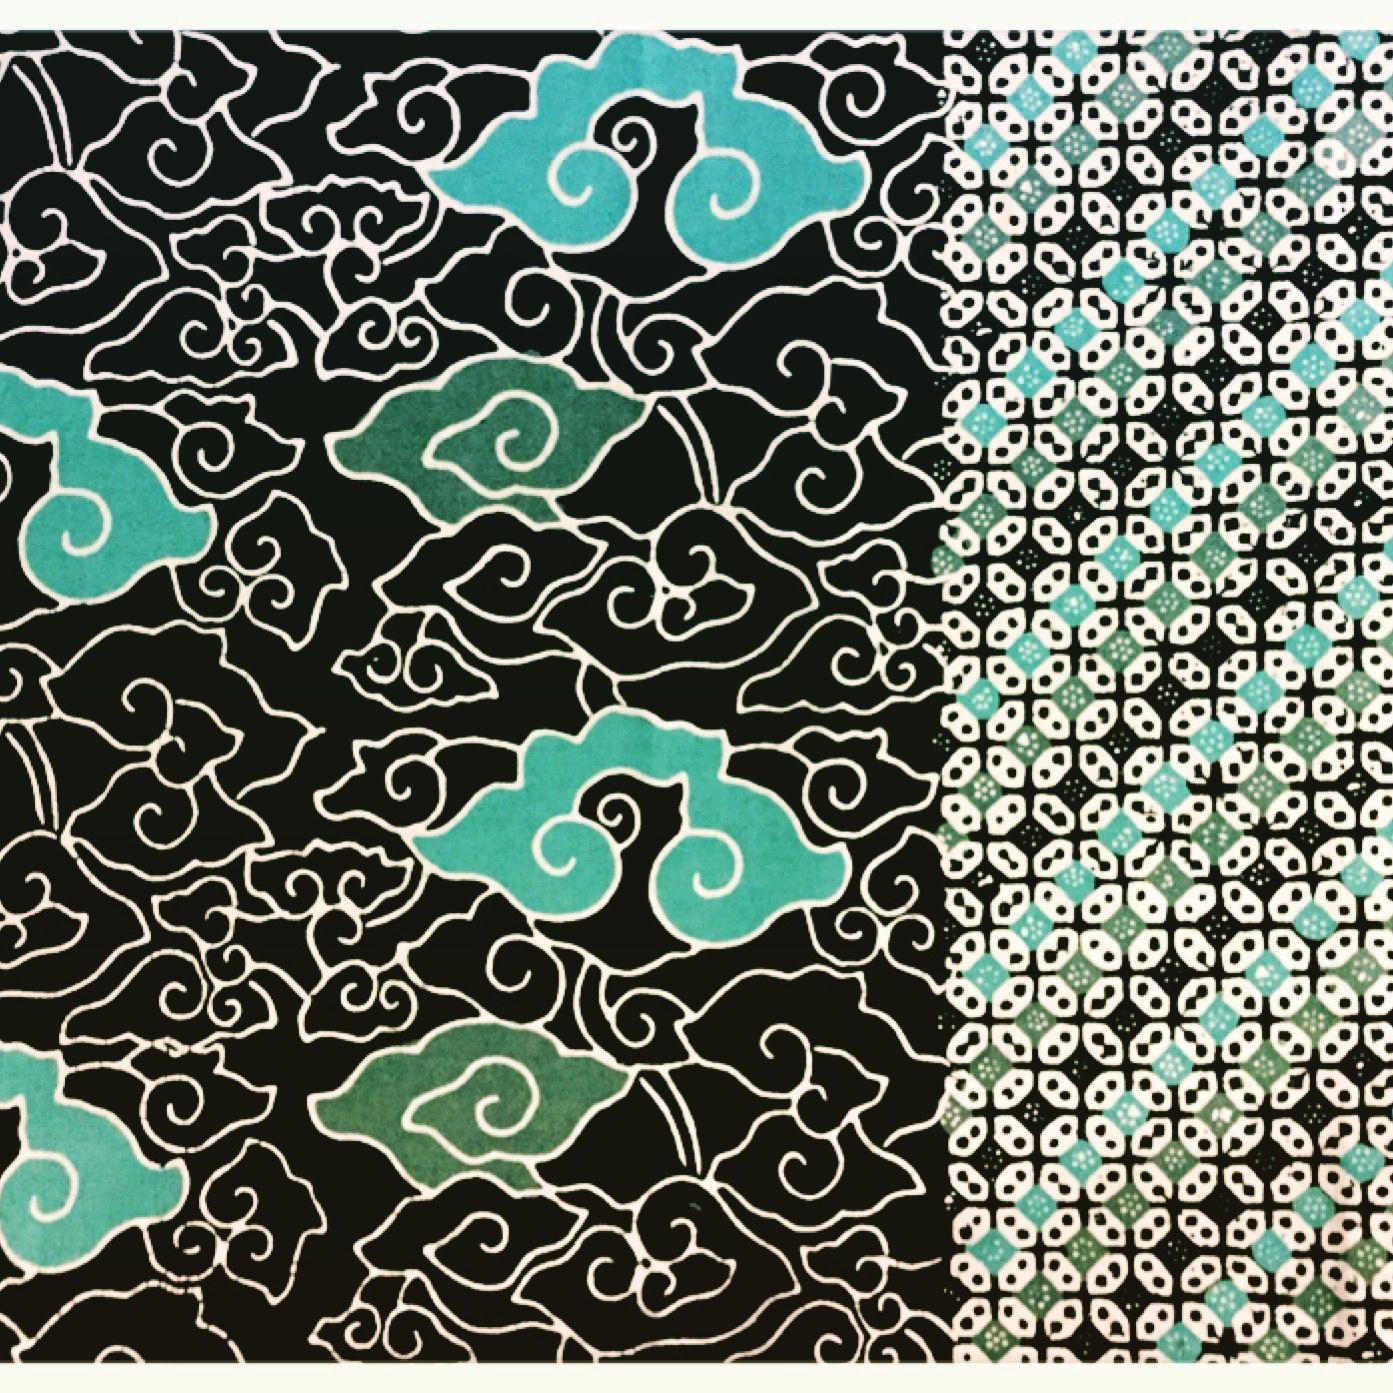 Batik Mega Mendung Tumpal Kawung Mixed Cirebon Jogja Pattern Pola Seni Modern